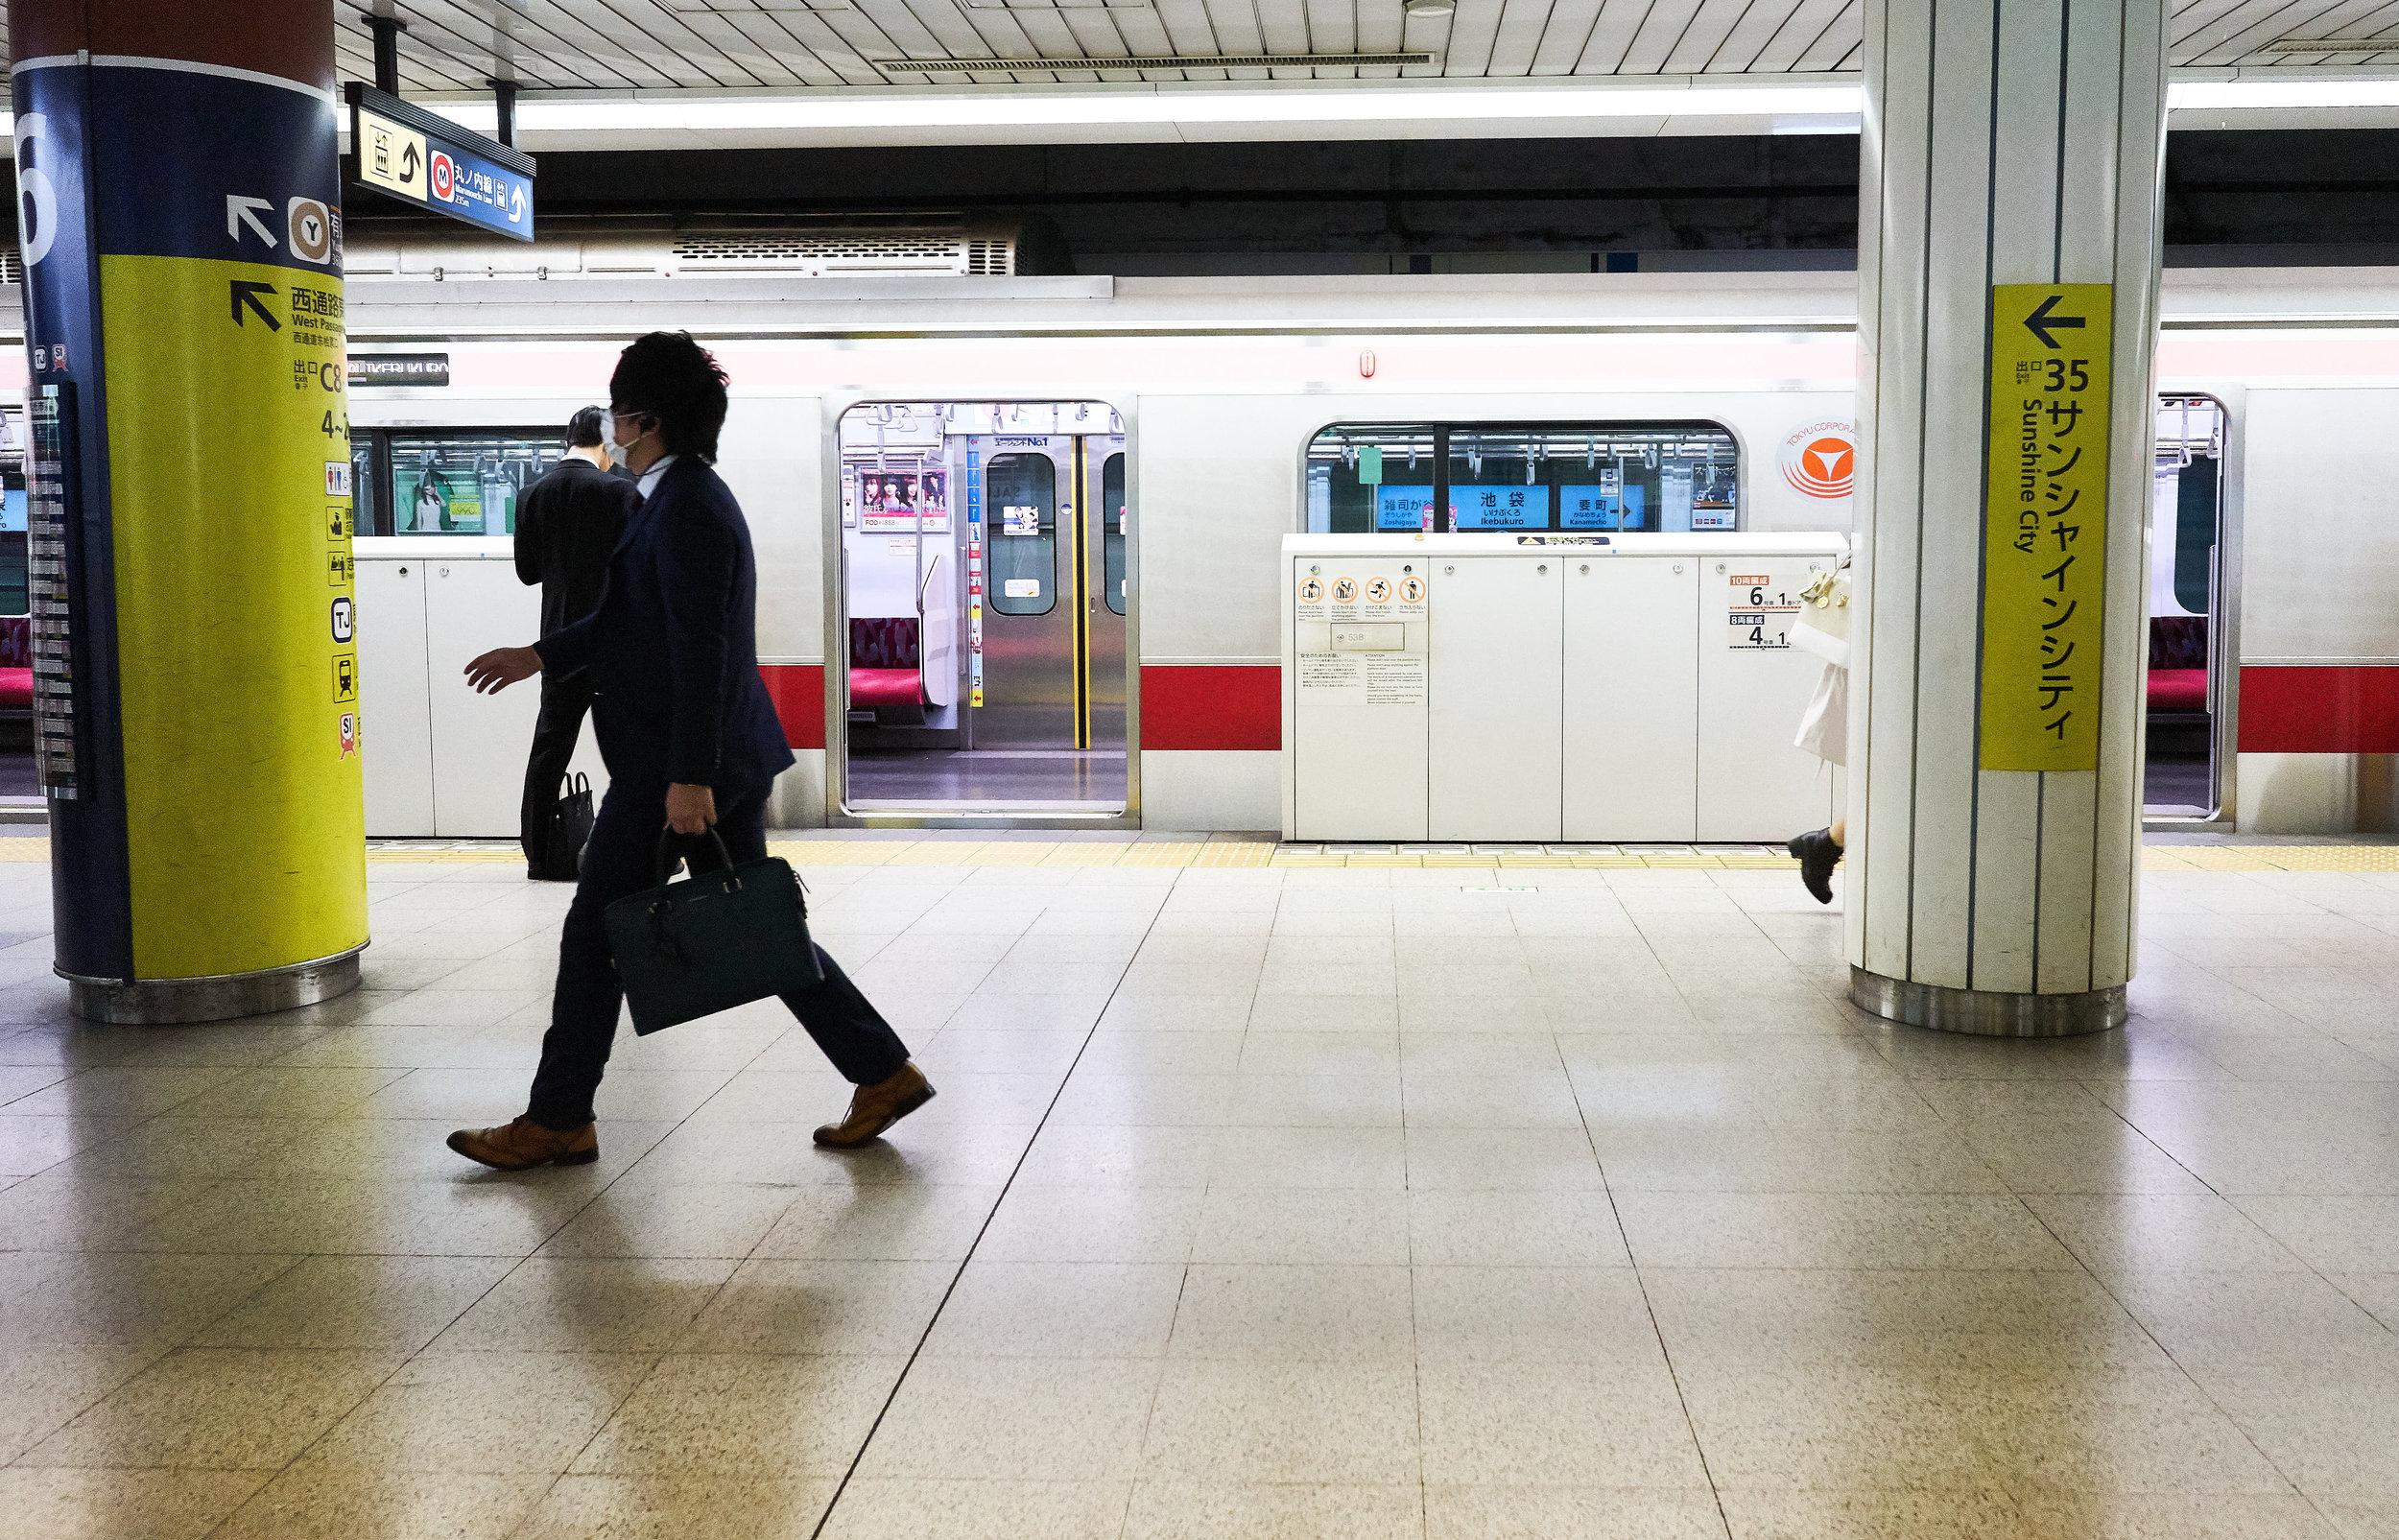 Tokio_Ubahn_1_kom.jpg